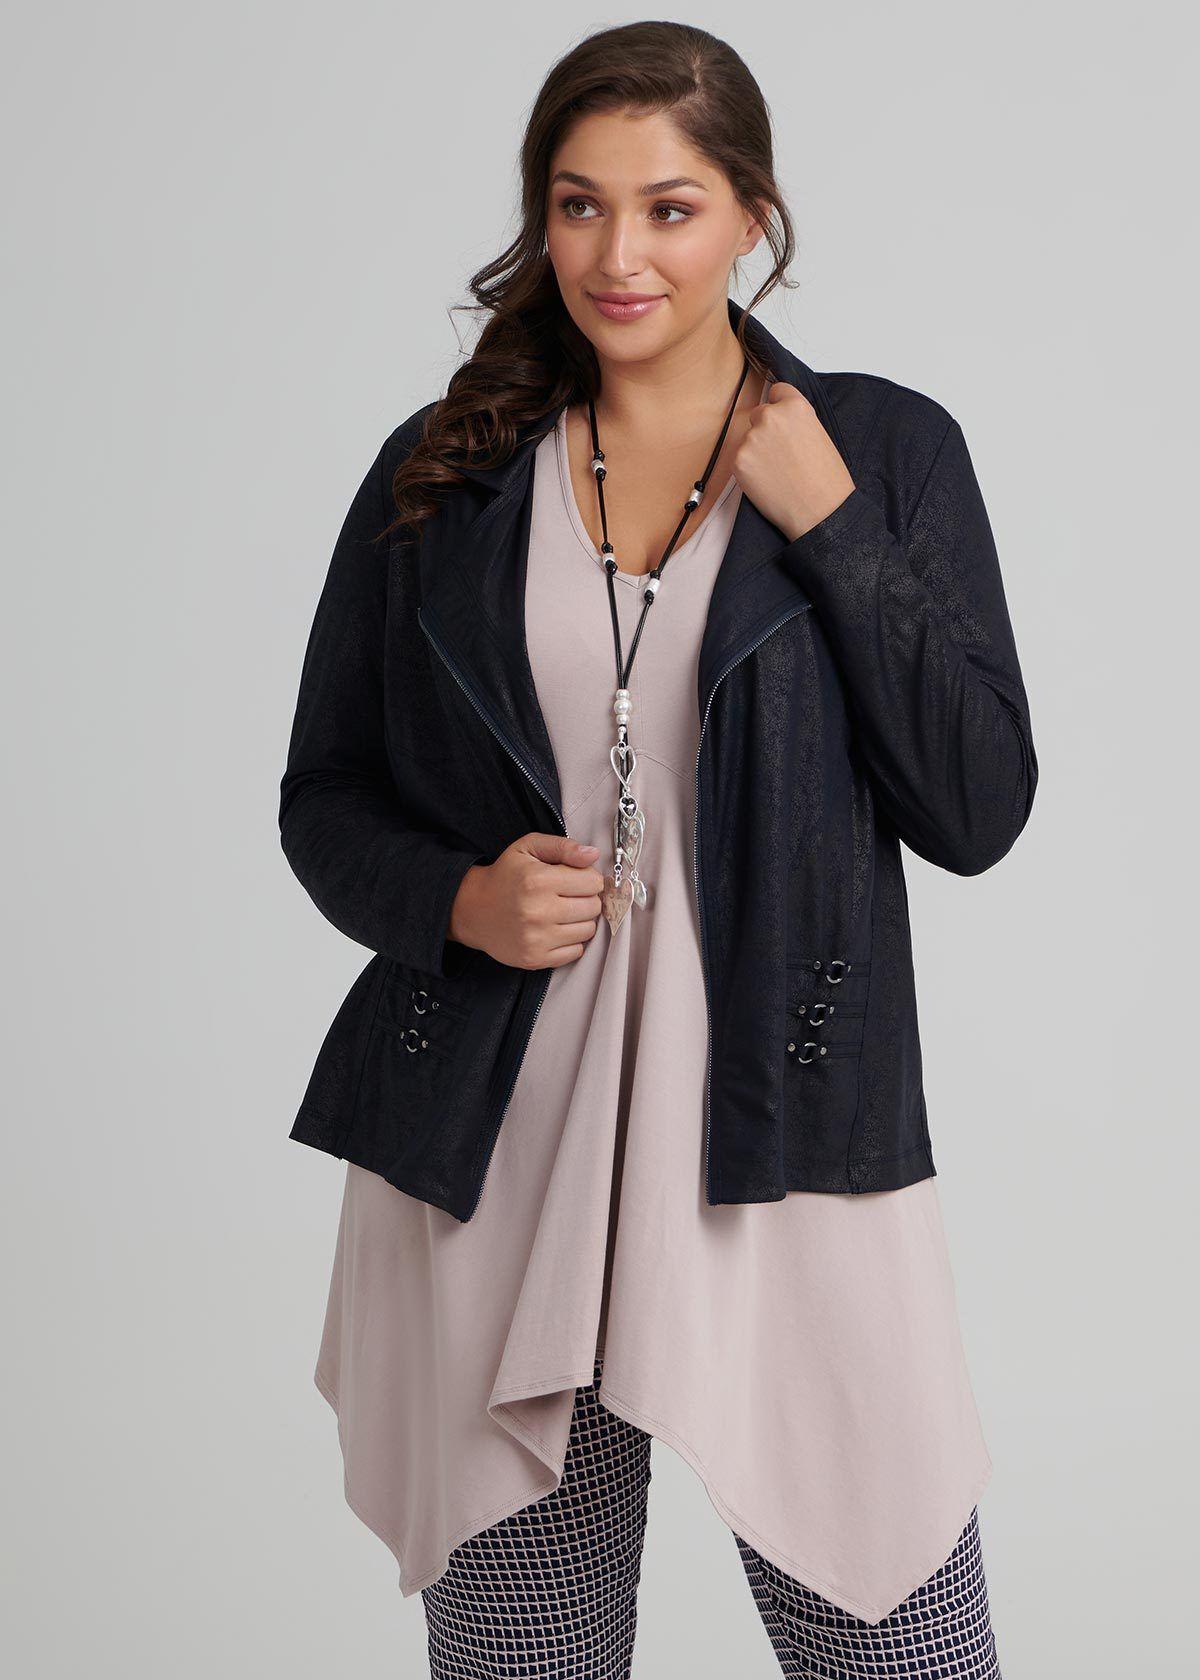 Details about Plus Size Polar Fleece Dressing Gown Zip Front s.3840 Australian Made